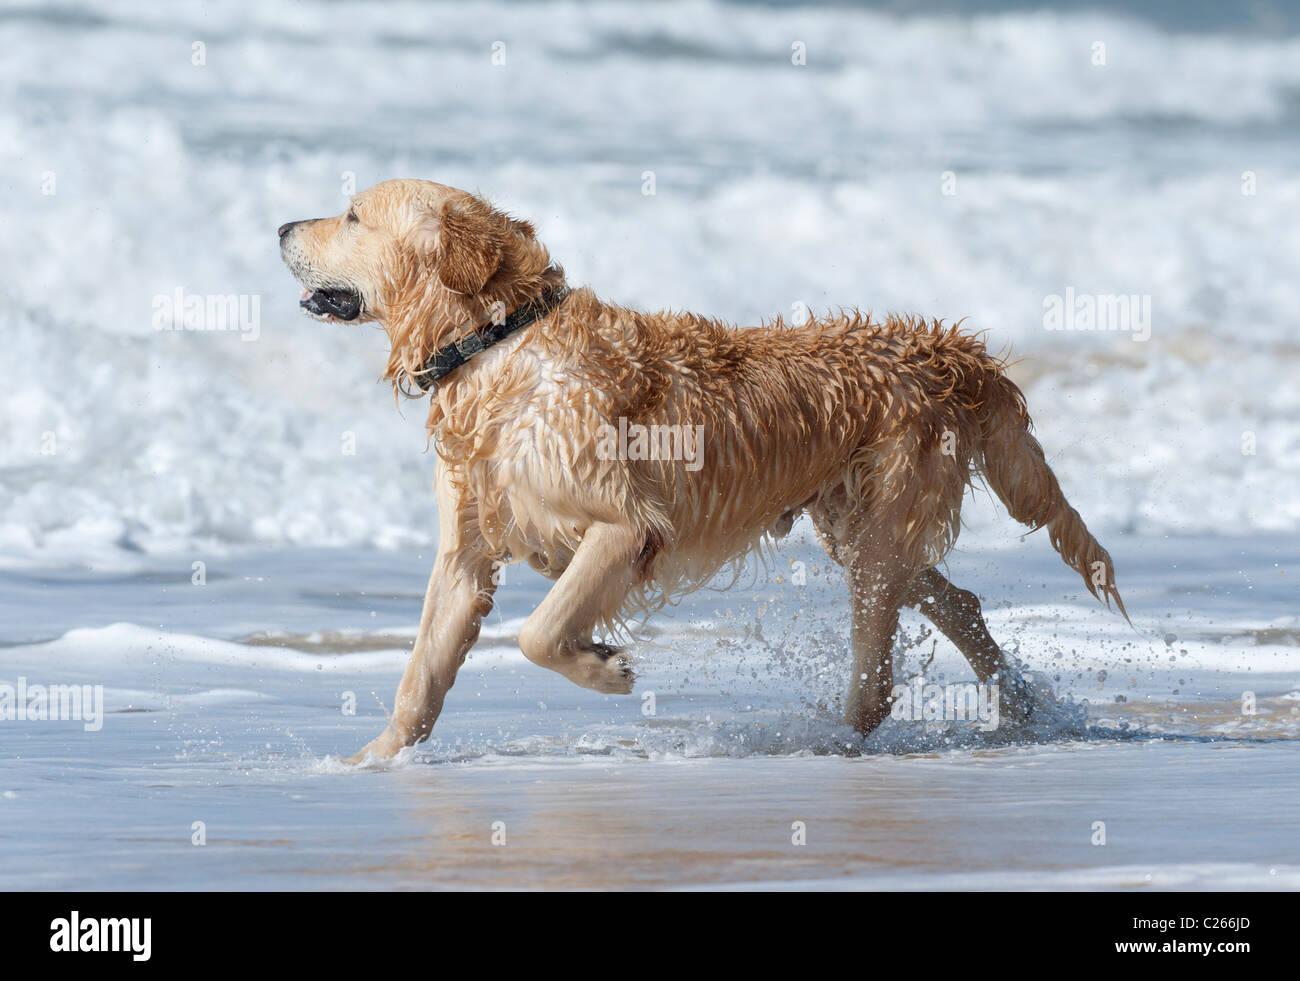 Golden retriever at the beach. - Stock Image